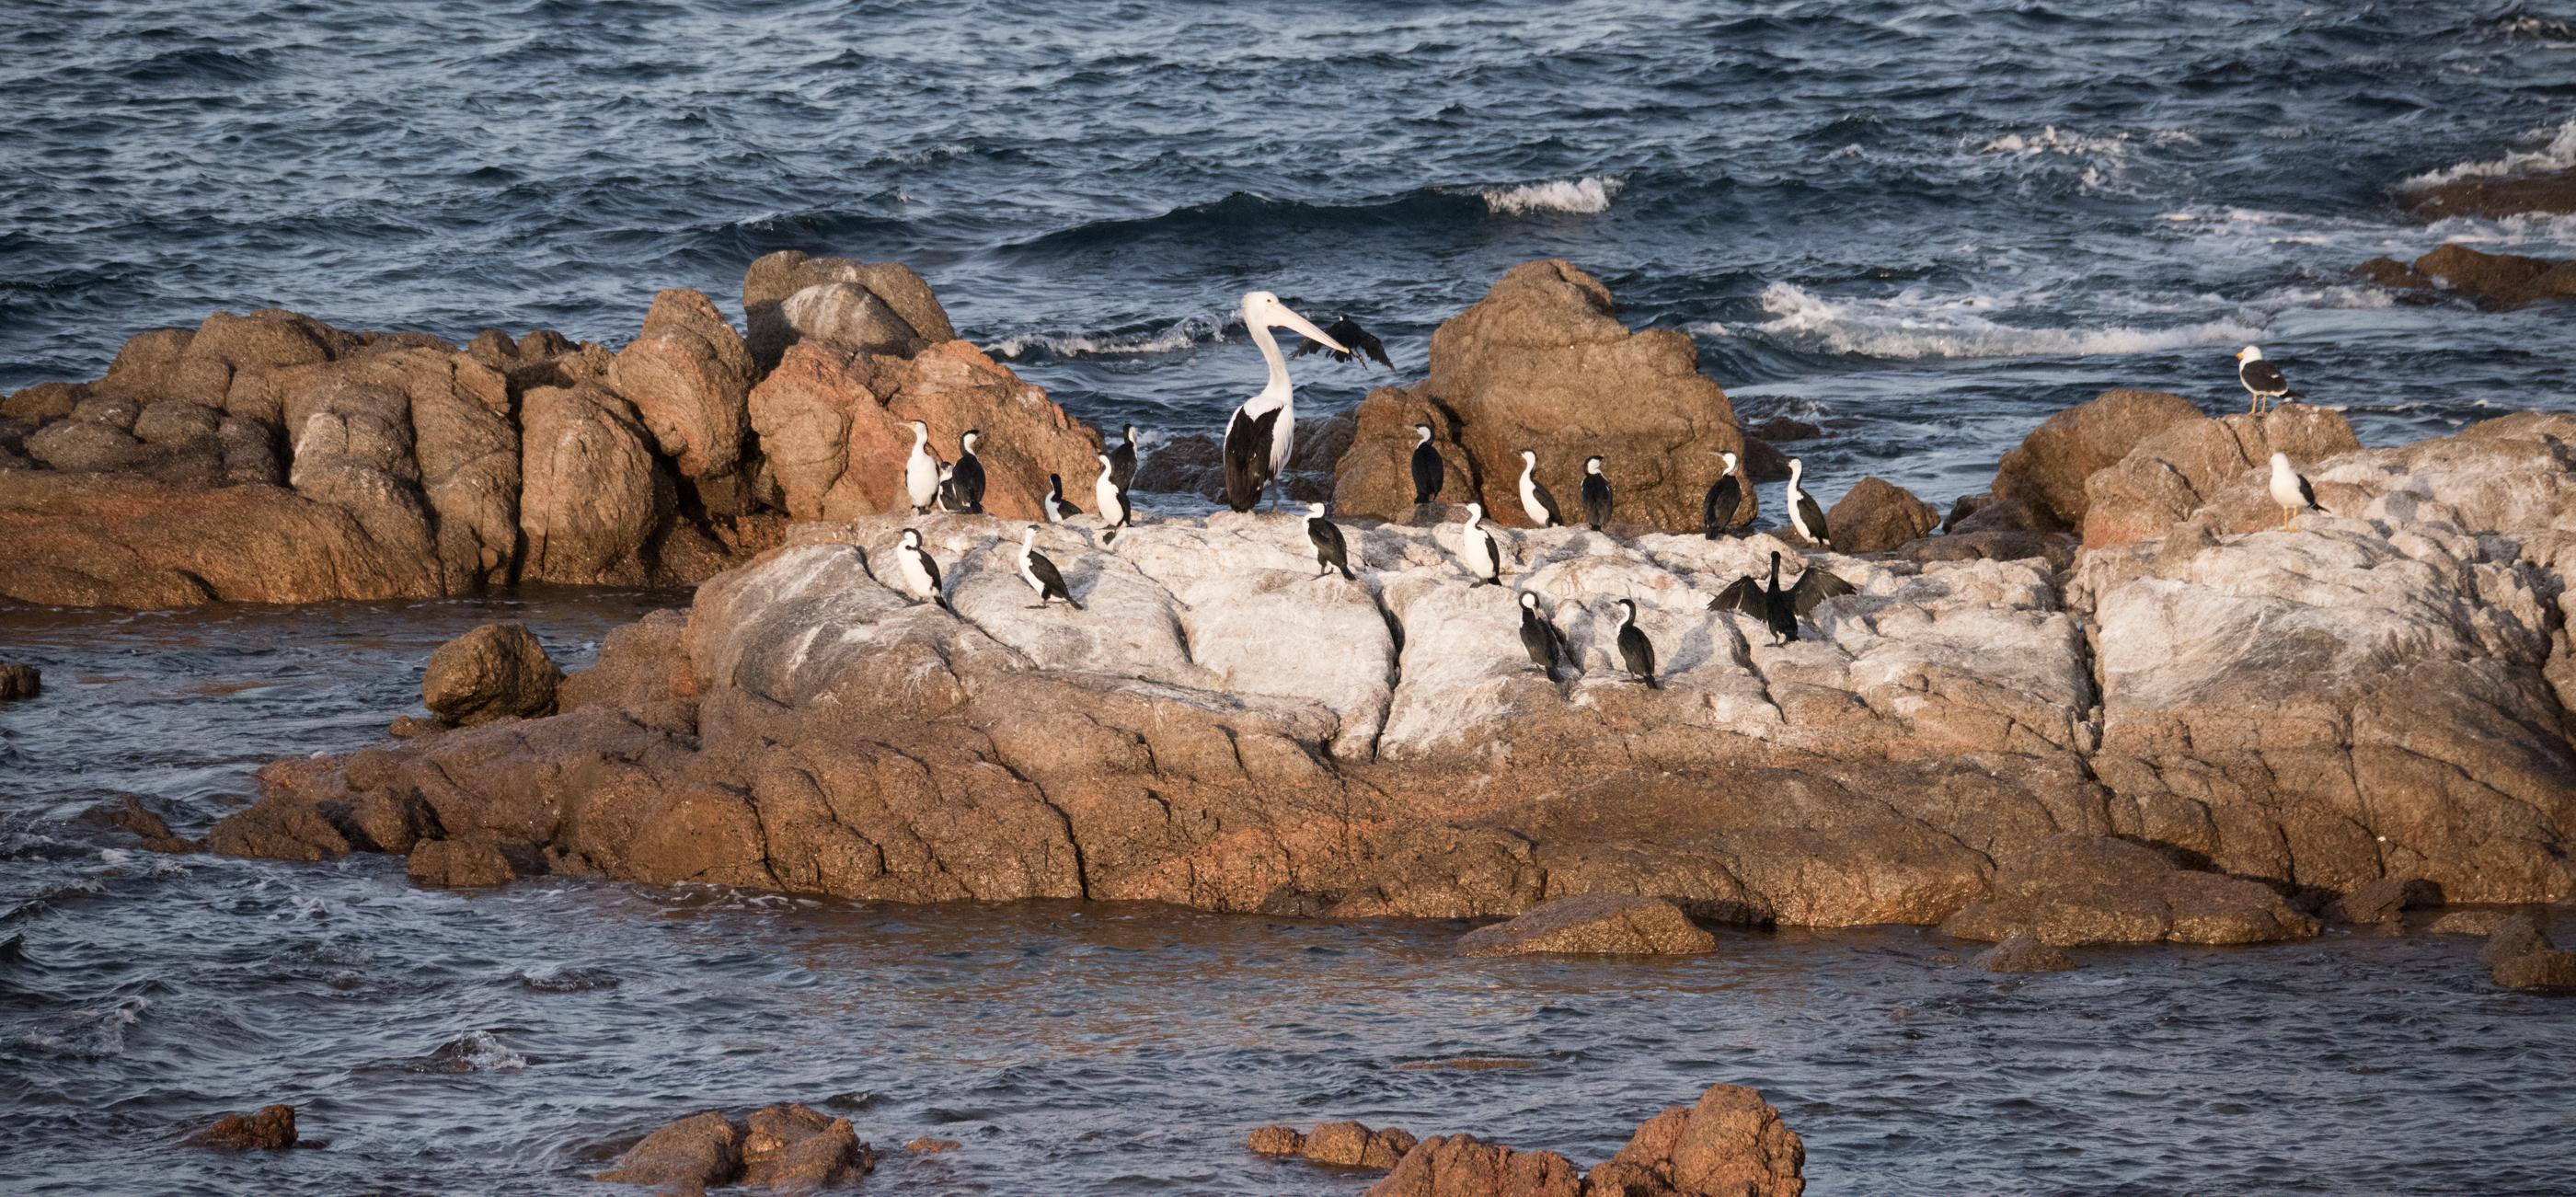 Pelican and pied cormorants south australia